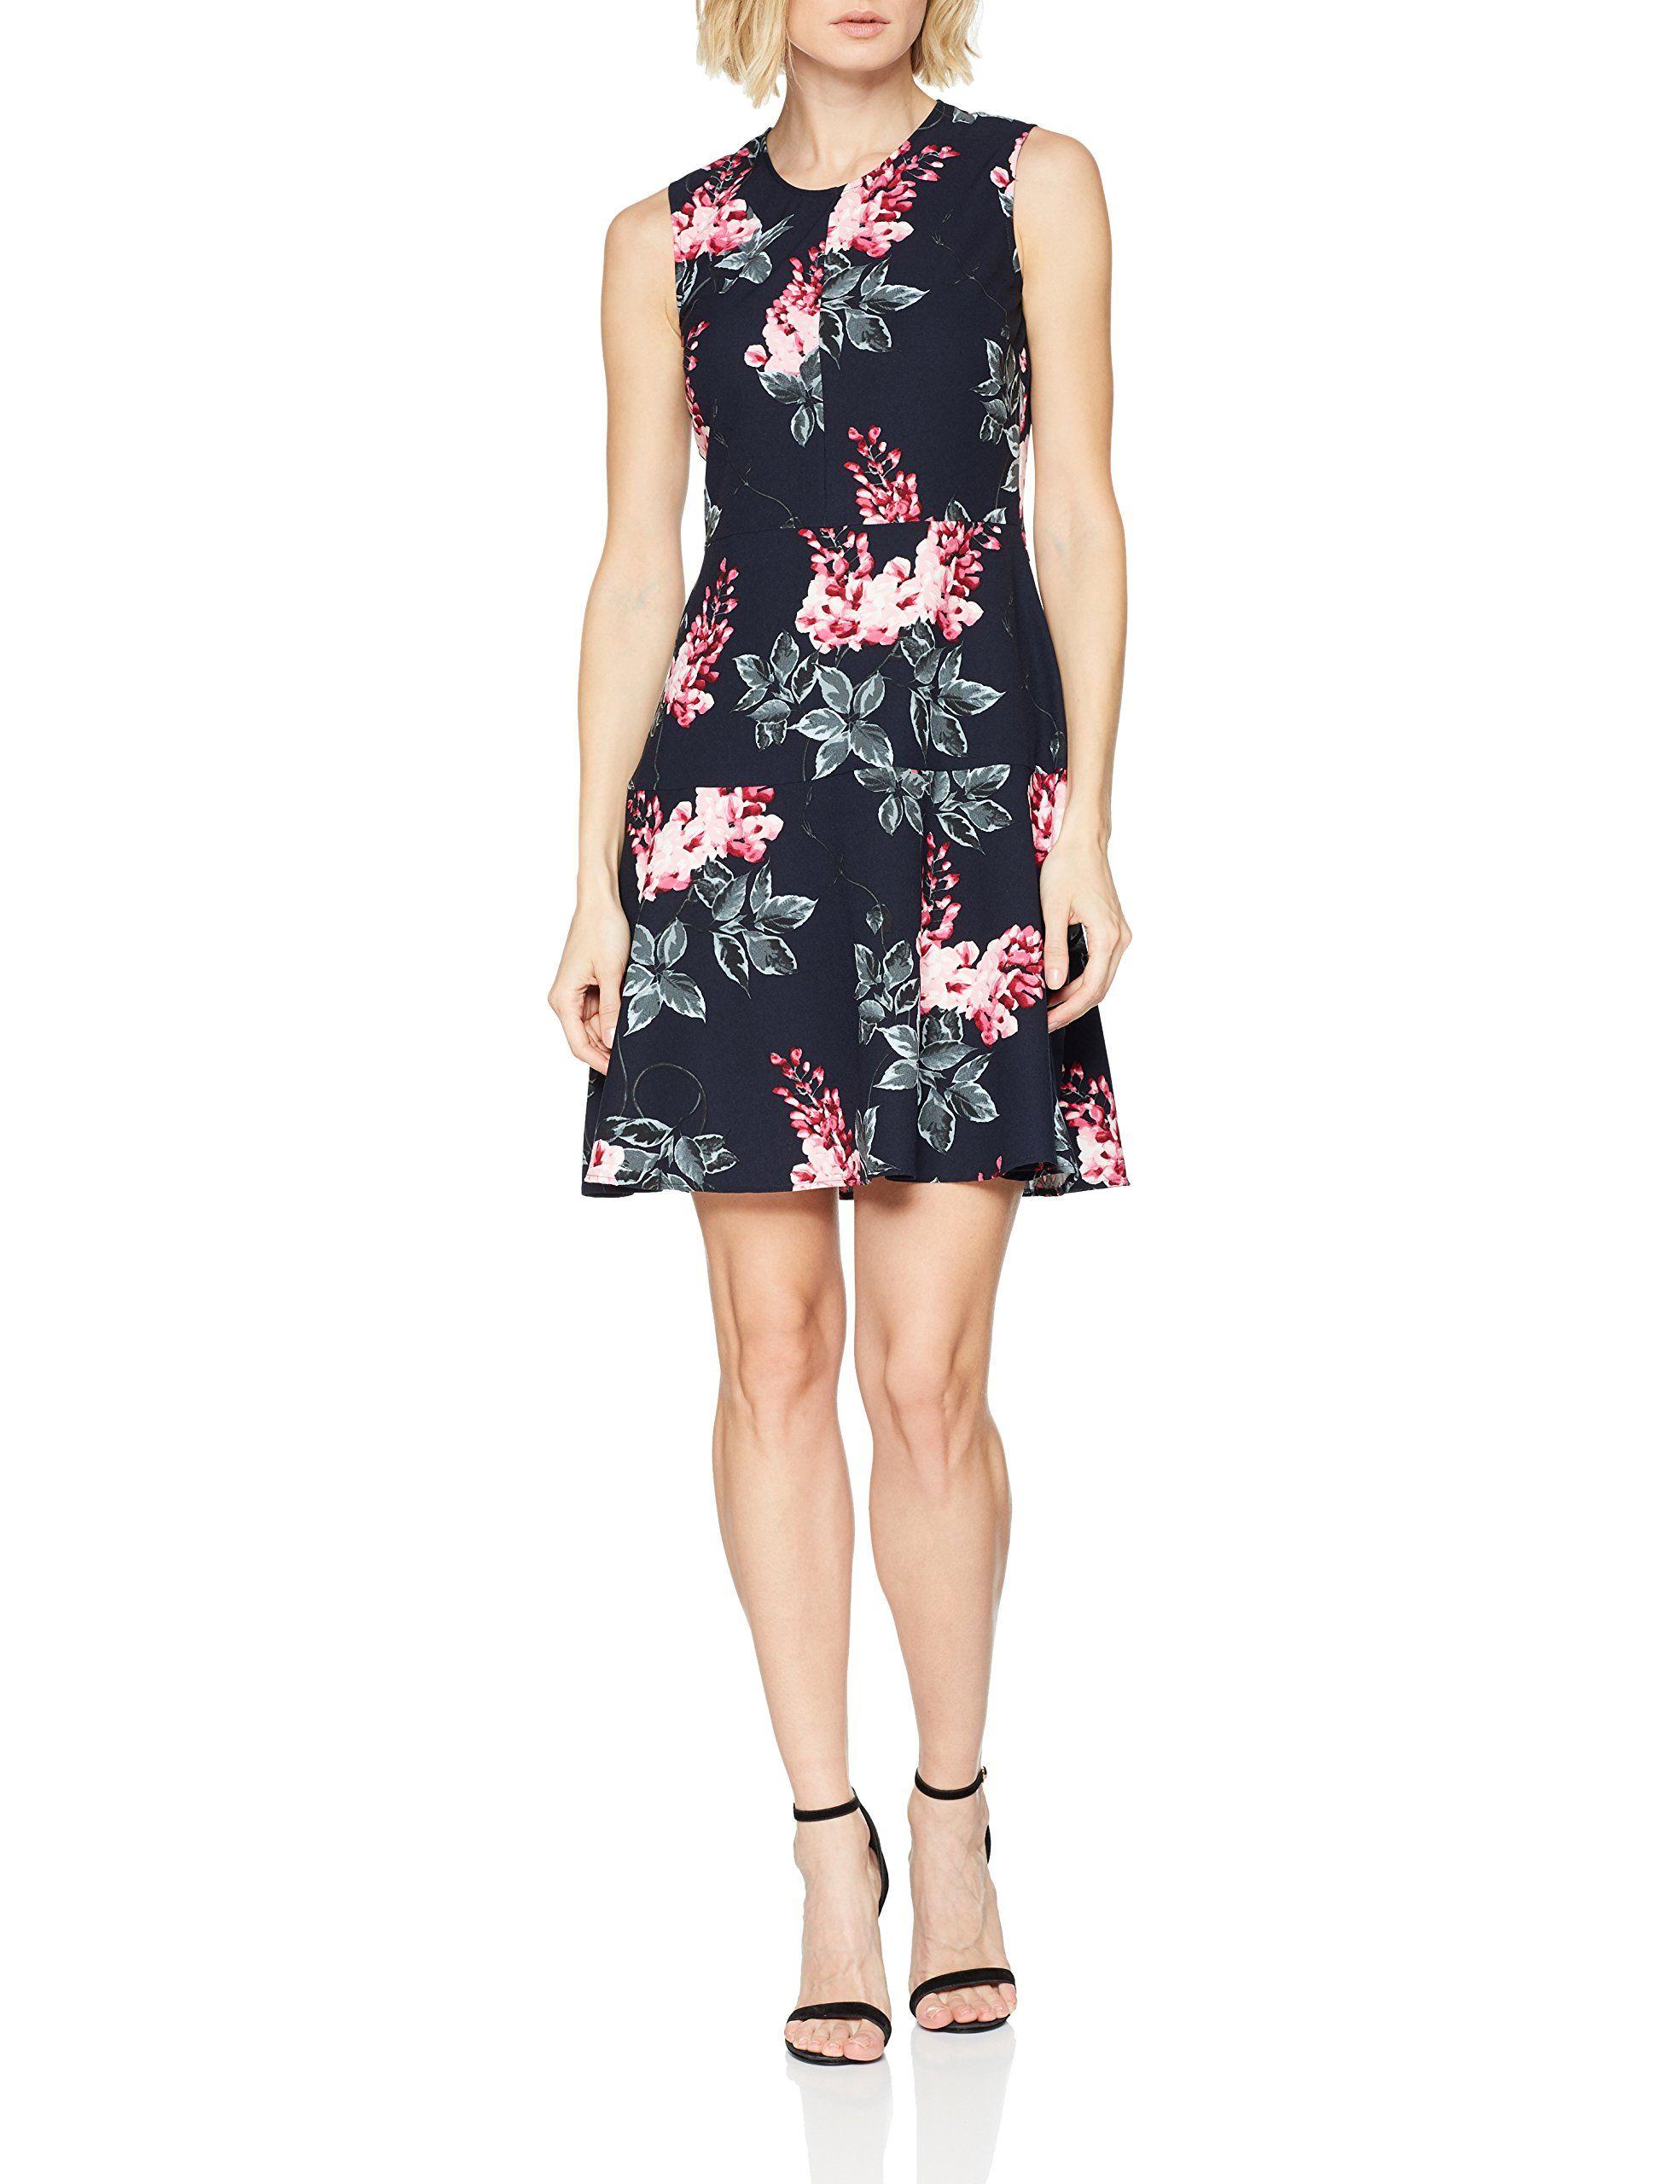 betty barclay damen kleid | dresses for work, dresses, fashion